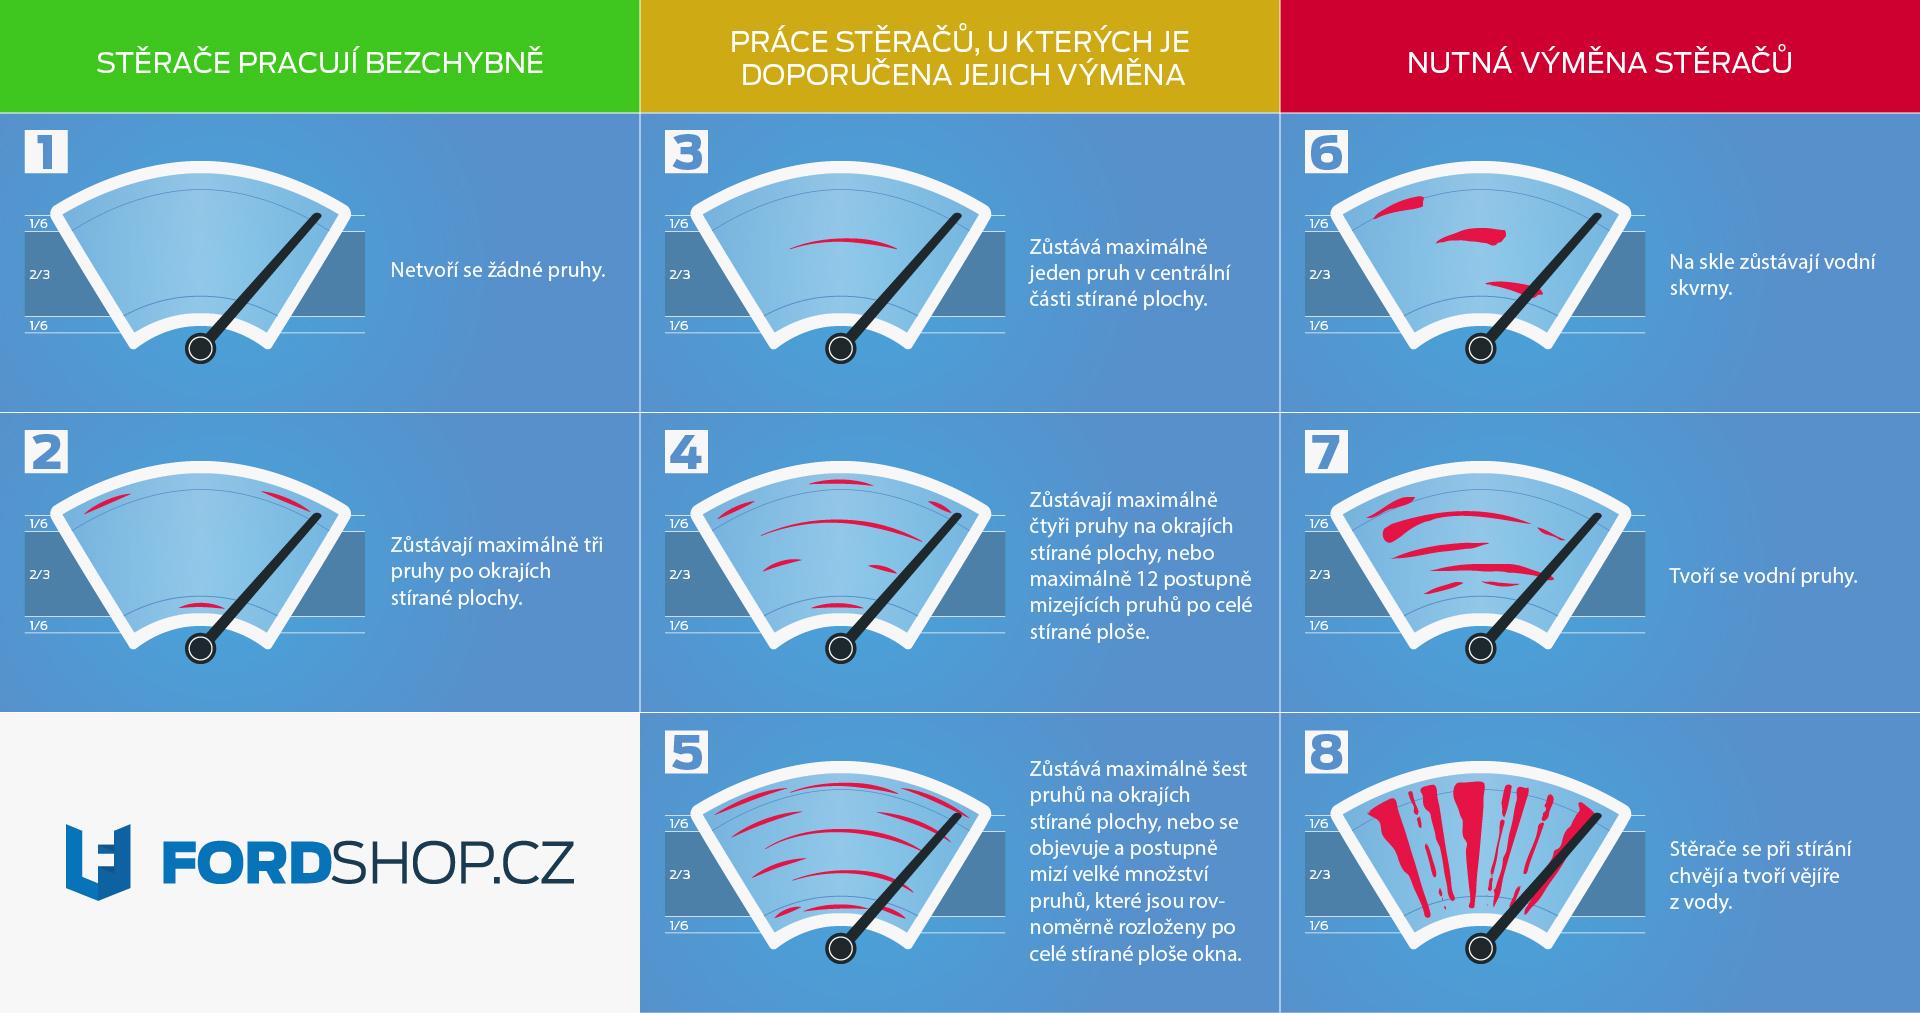 fordshop-sterace-ford-infografika